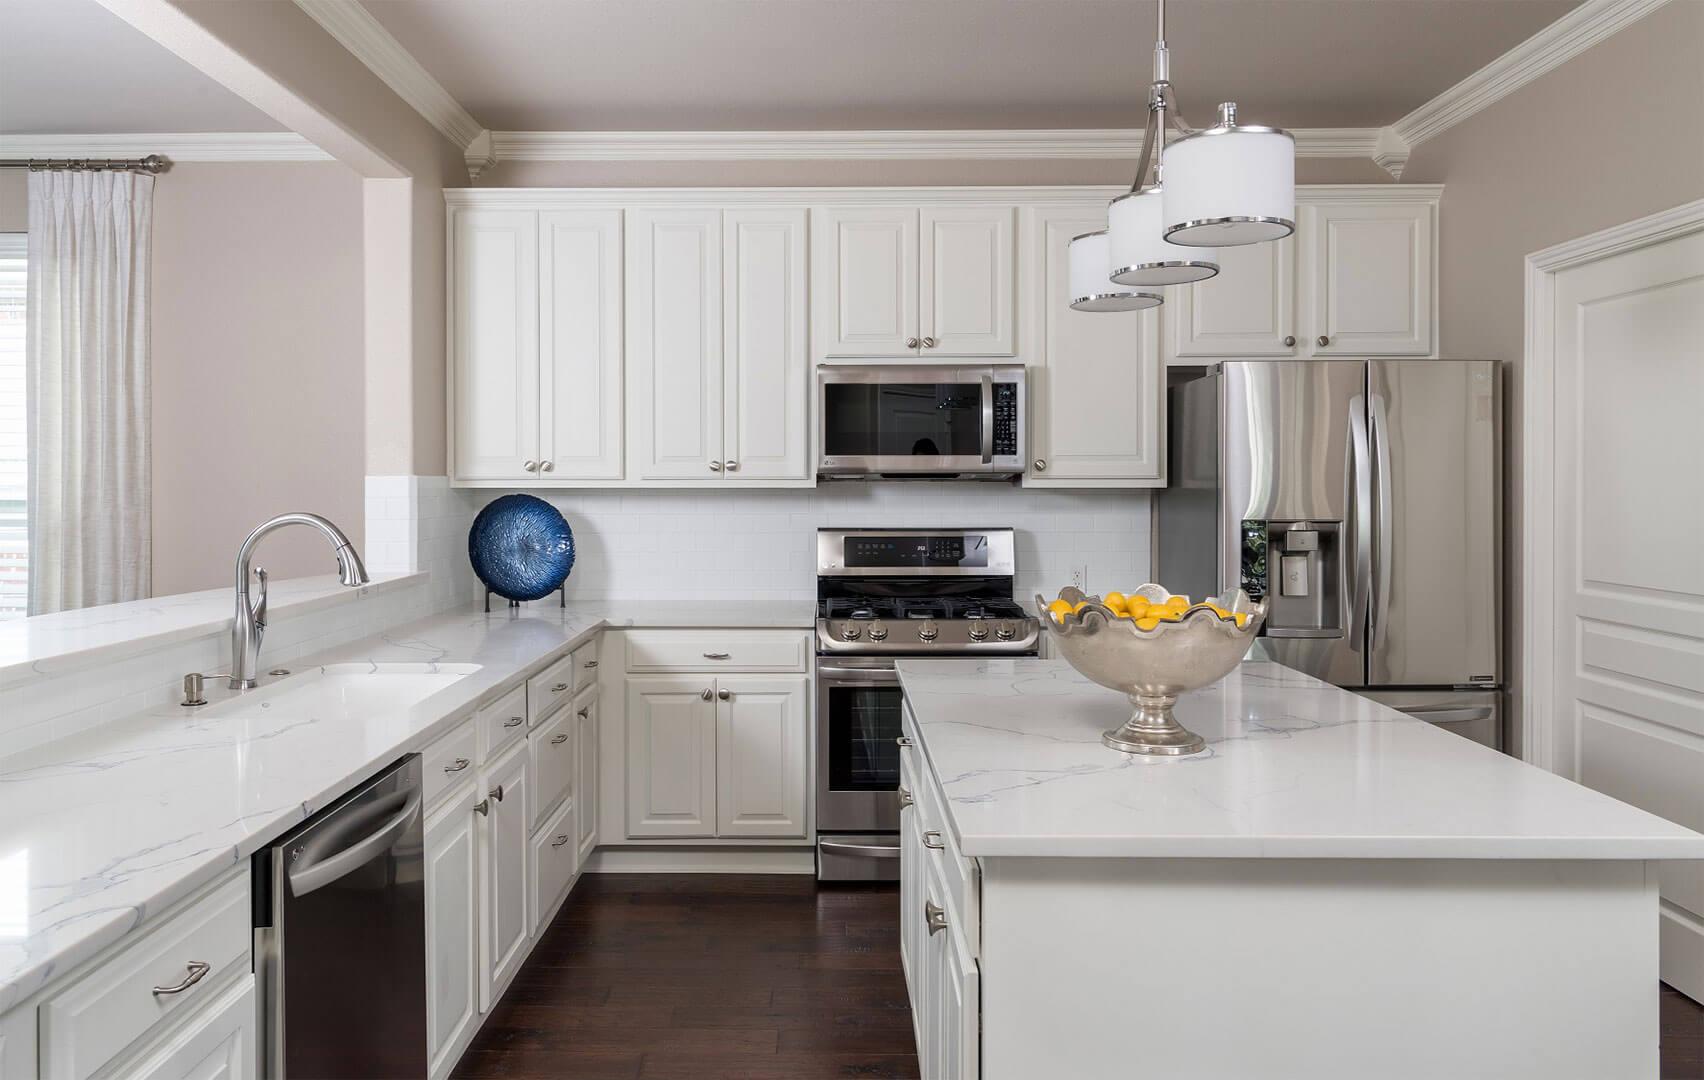 Zeller - Kitchen 5 - Dallas Interior Designer serving Plano, Frisco, Dallas, Allen for Decorating Den Interiors D'KOR HOME by Dee Frazier Interiors